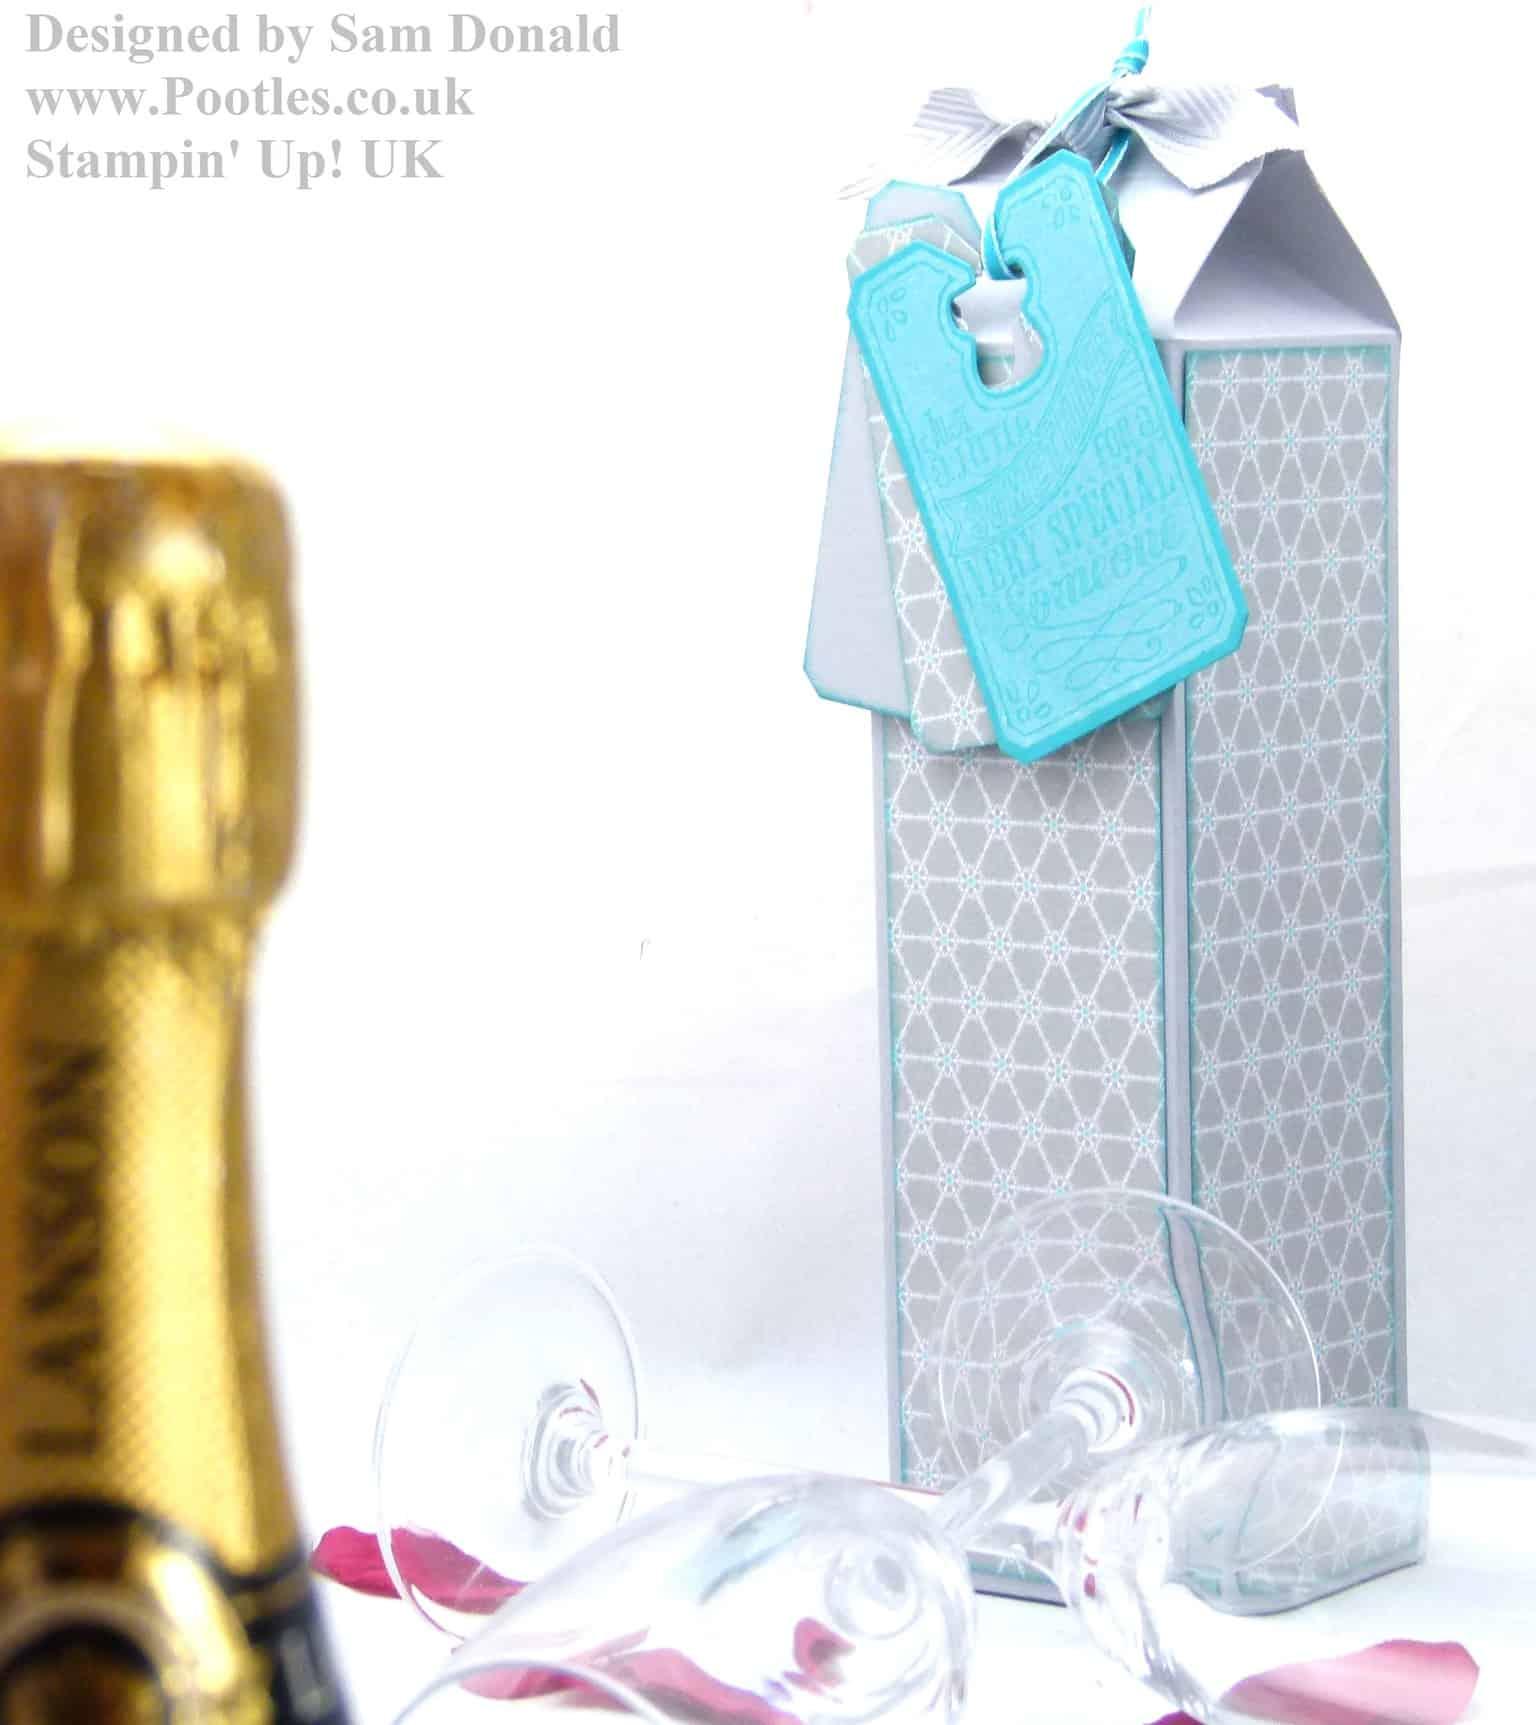 Pootles Stampin Up UK Champagne Box